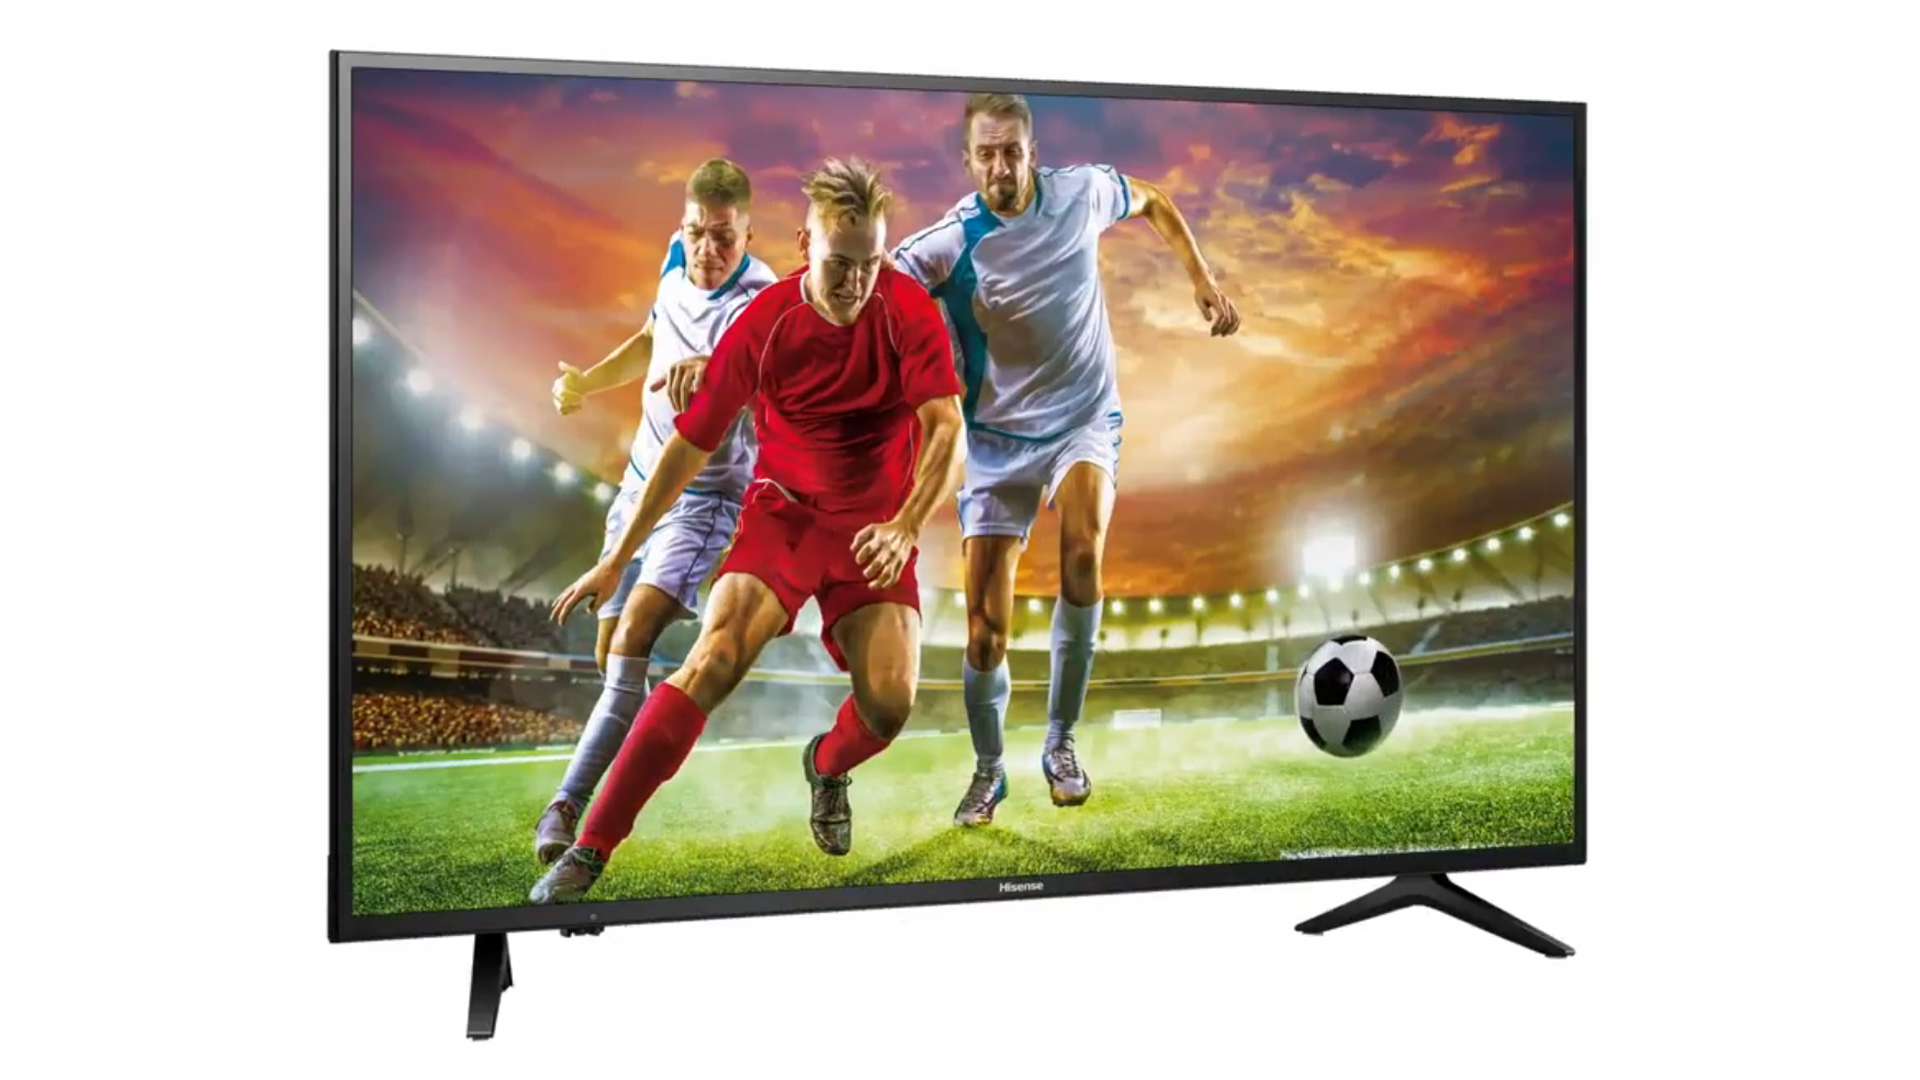 Hisense H6 Series 4K UHD Smart TV (2018) Audio/Video Reviews